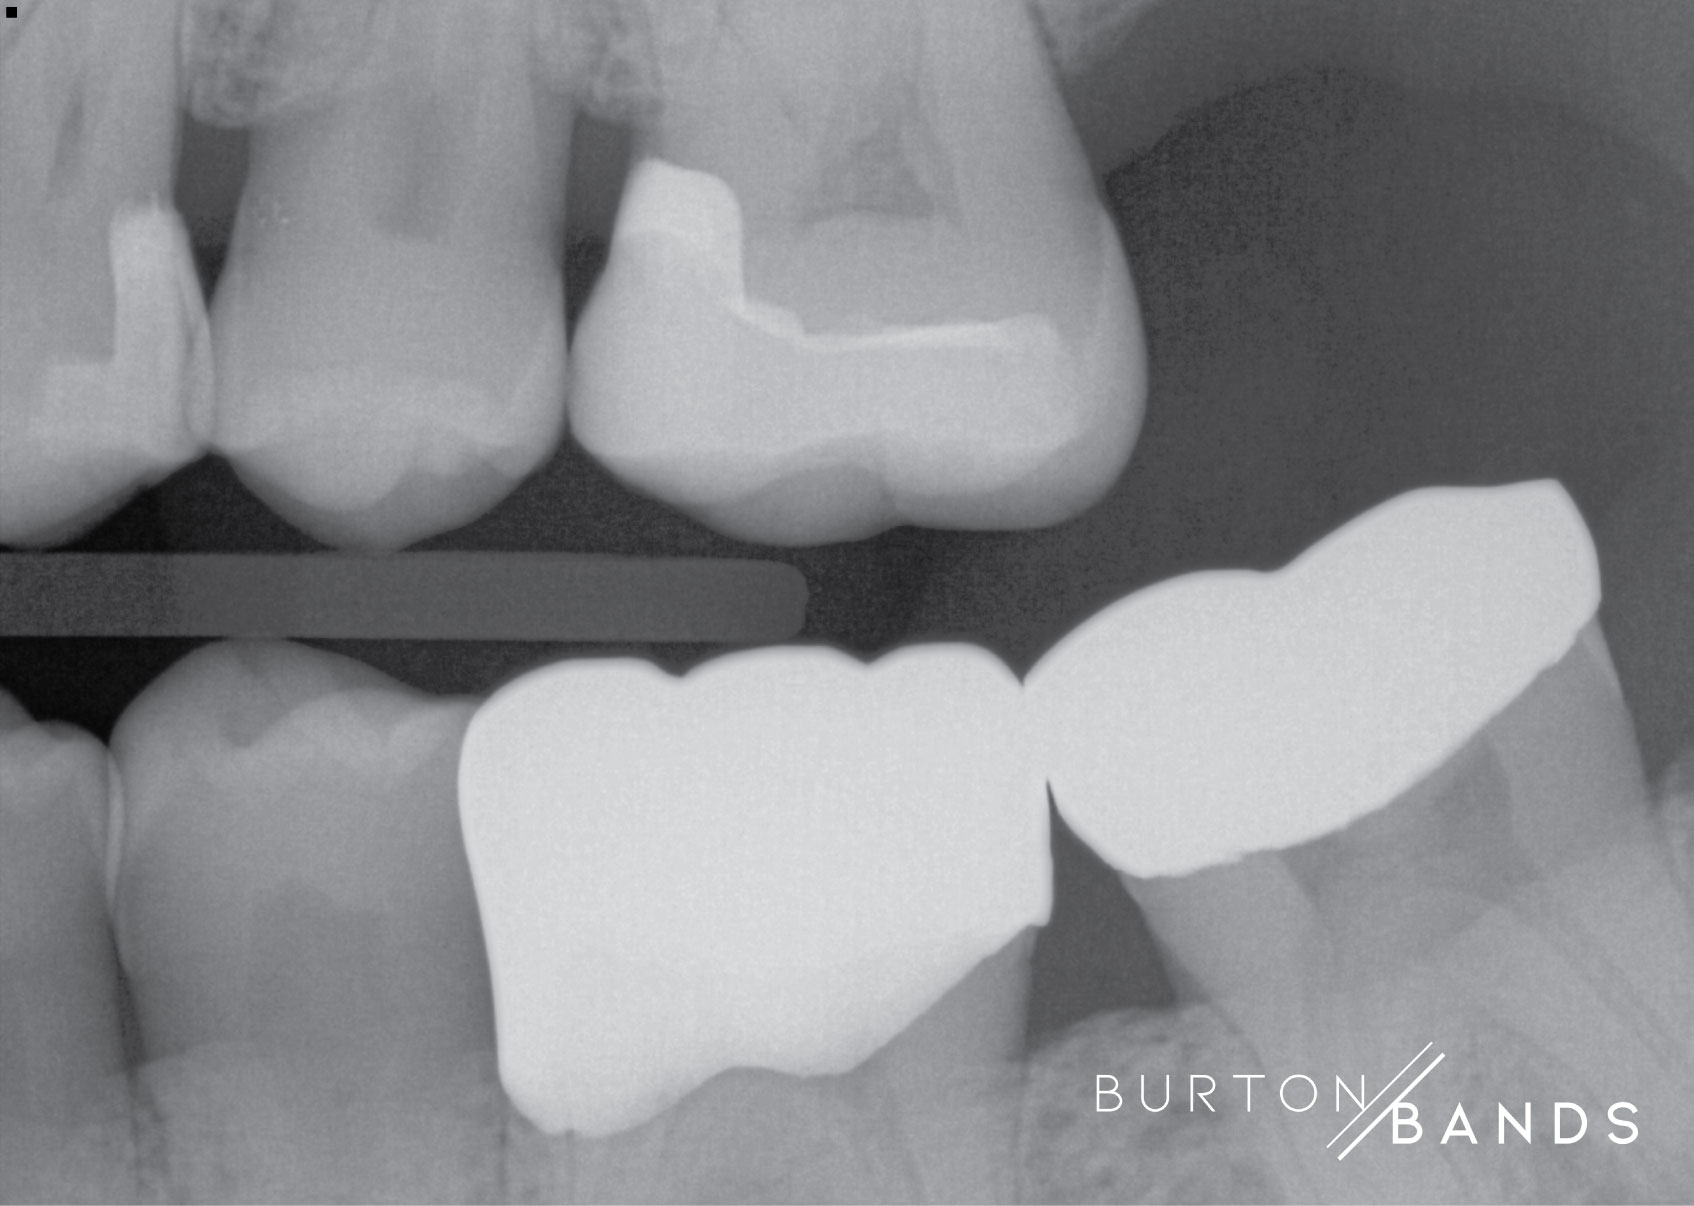 burton-image-4.jpg